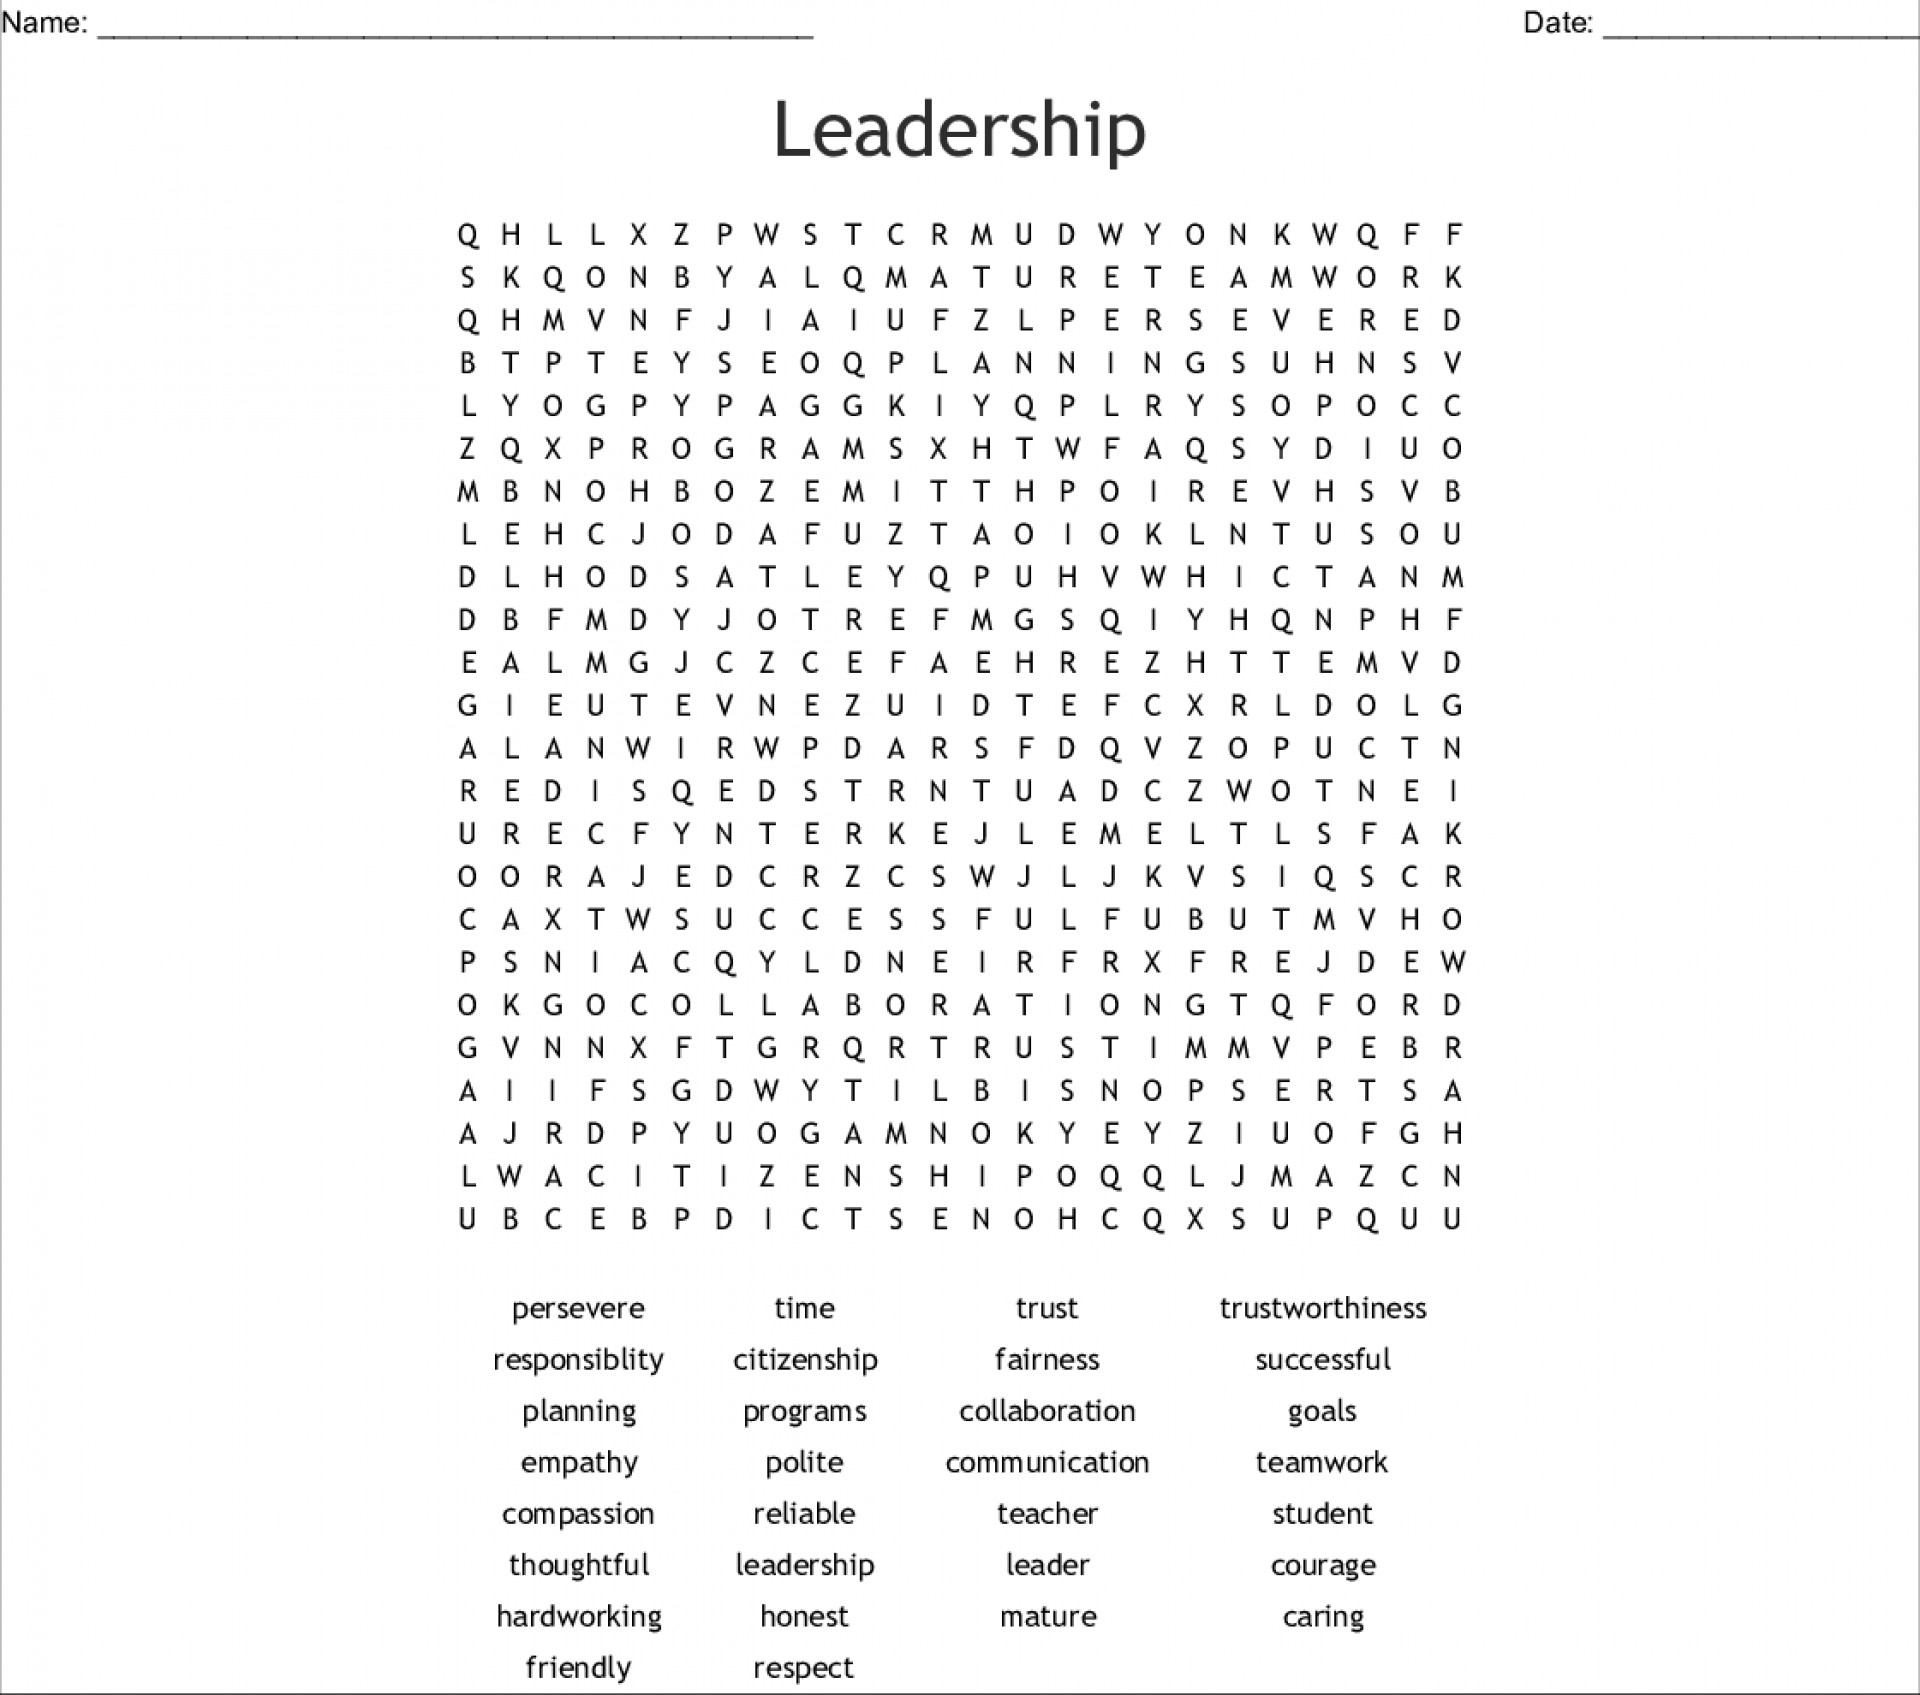 011 Leadership Printable Word Hard Searches